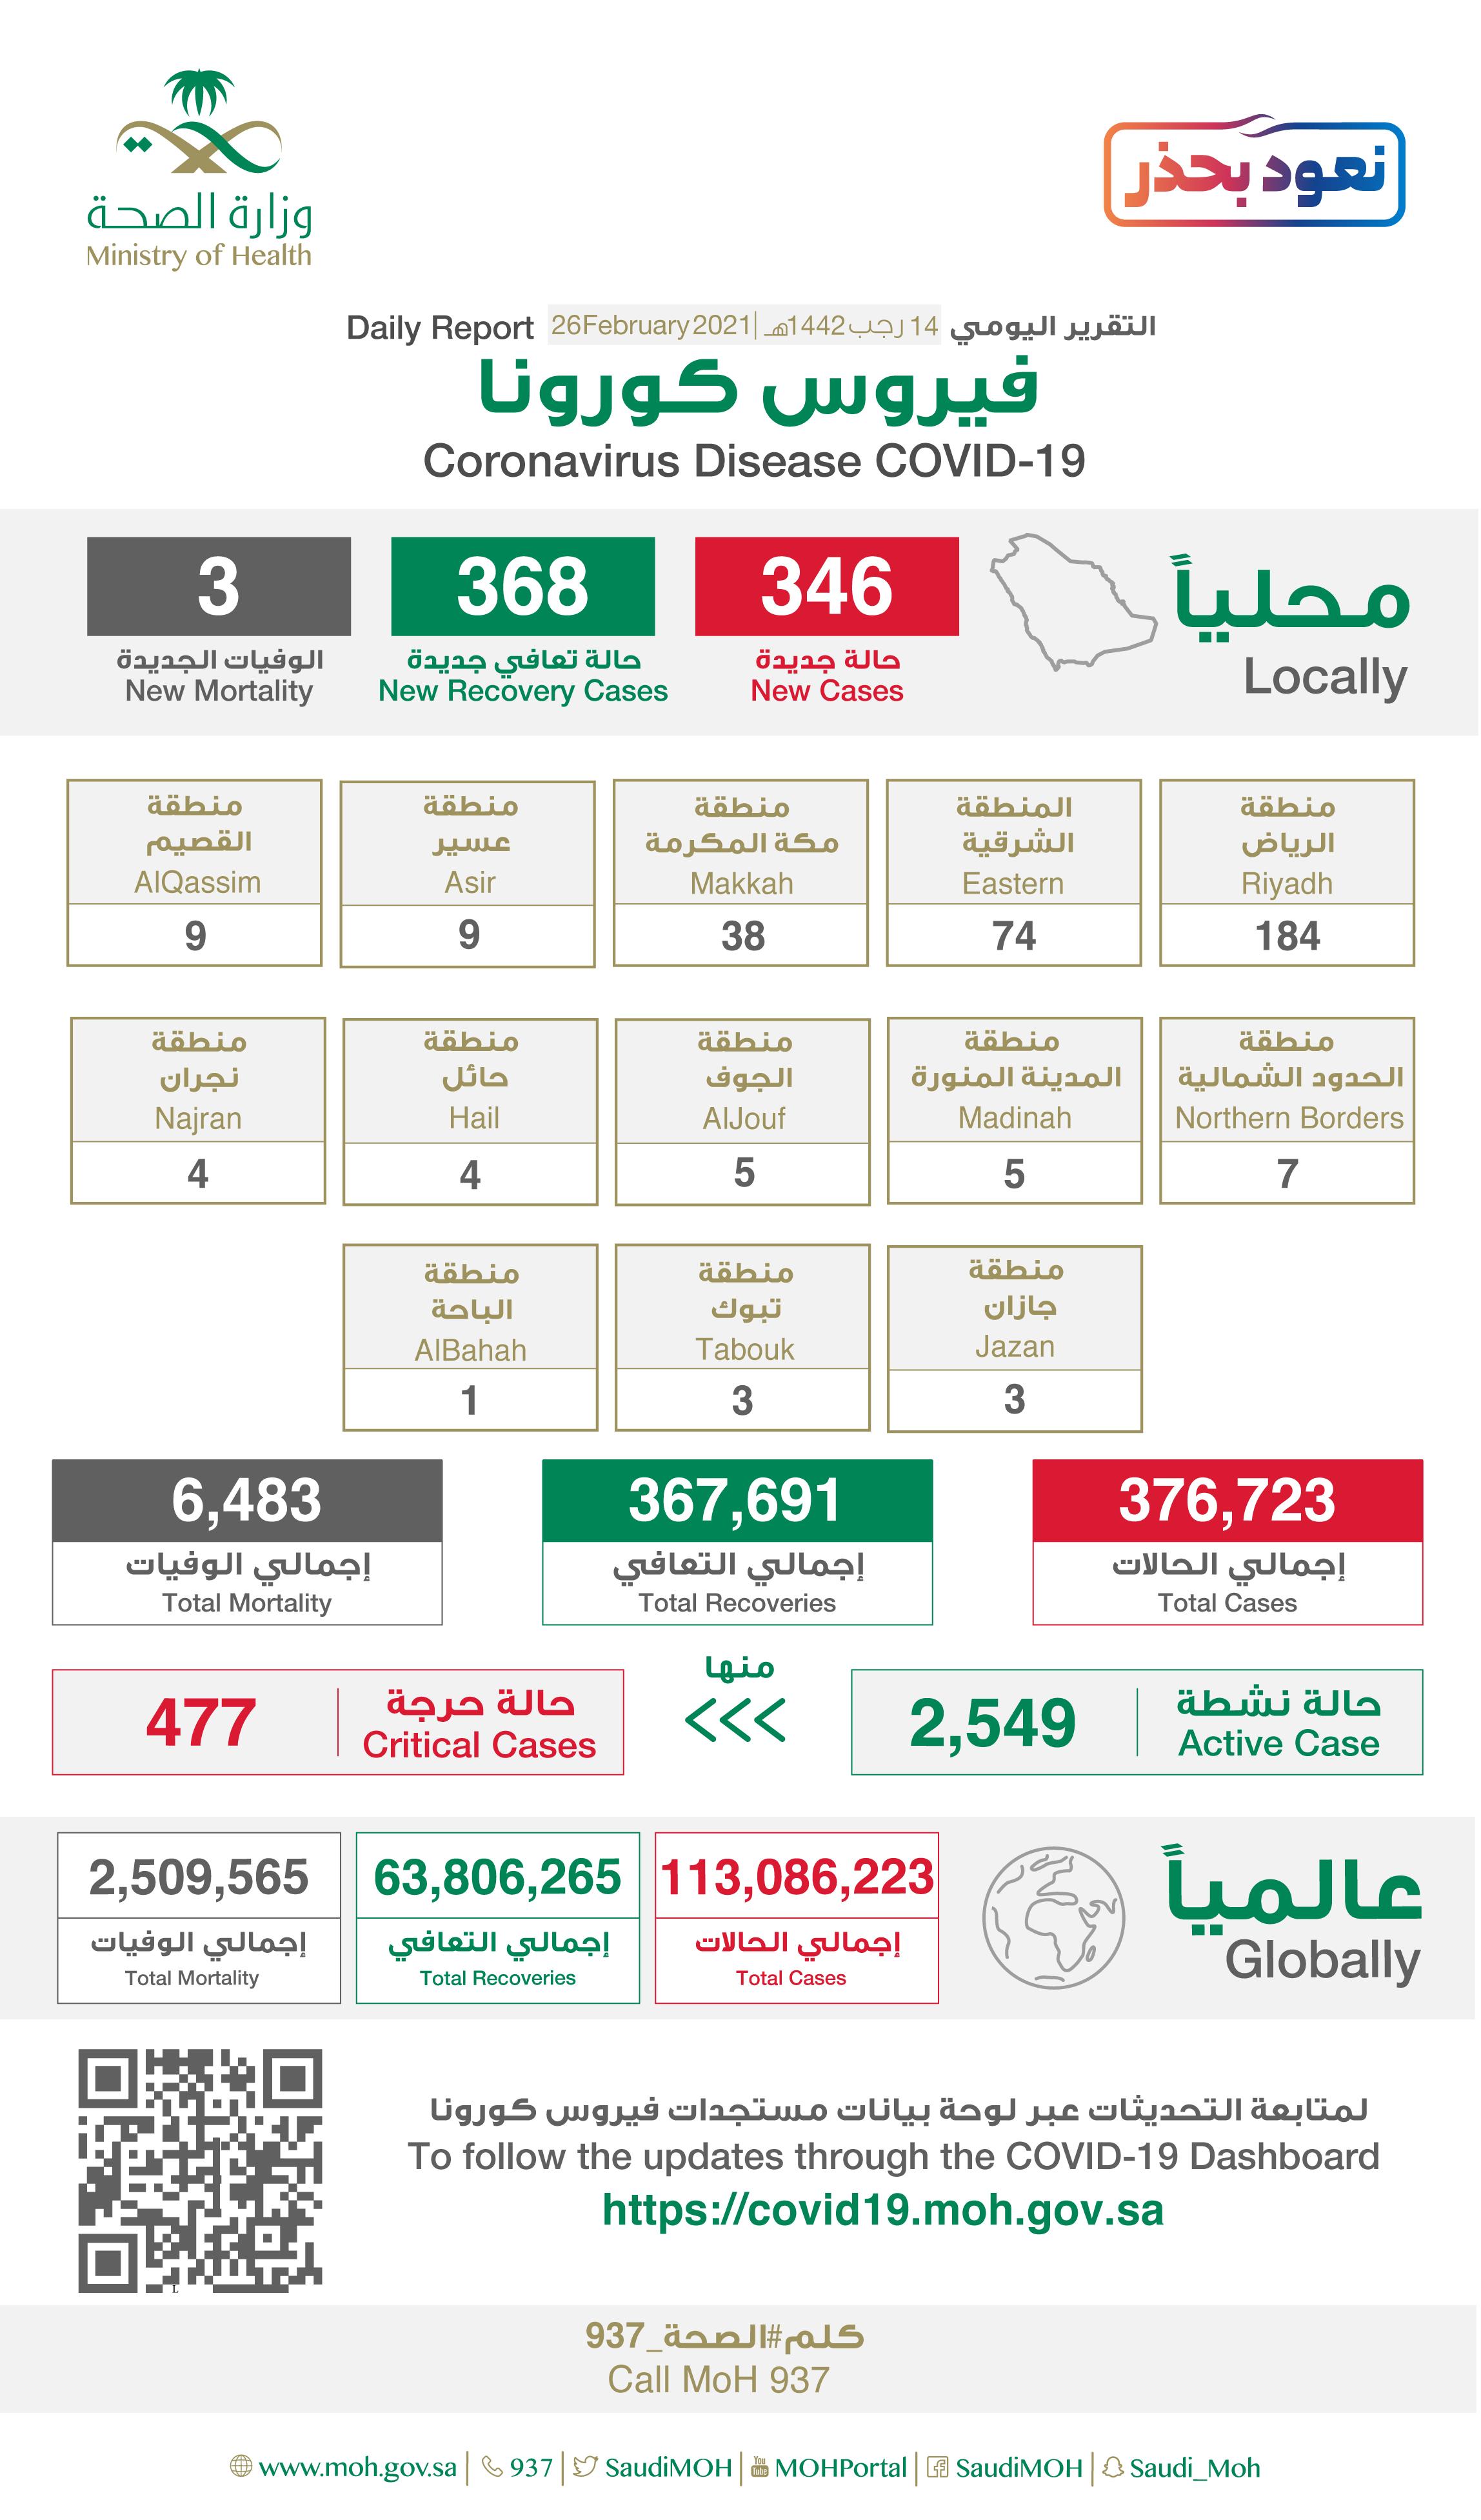 Saudi Arabia Coronavirus : Total Cases :376,723 , New Cases : 346, Cured : 367,691 , Deaths: 6,483, Active Cases : 2,549